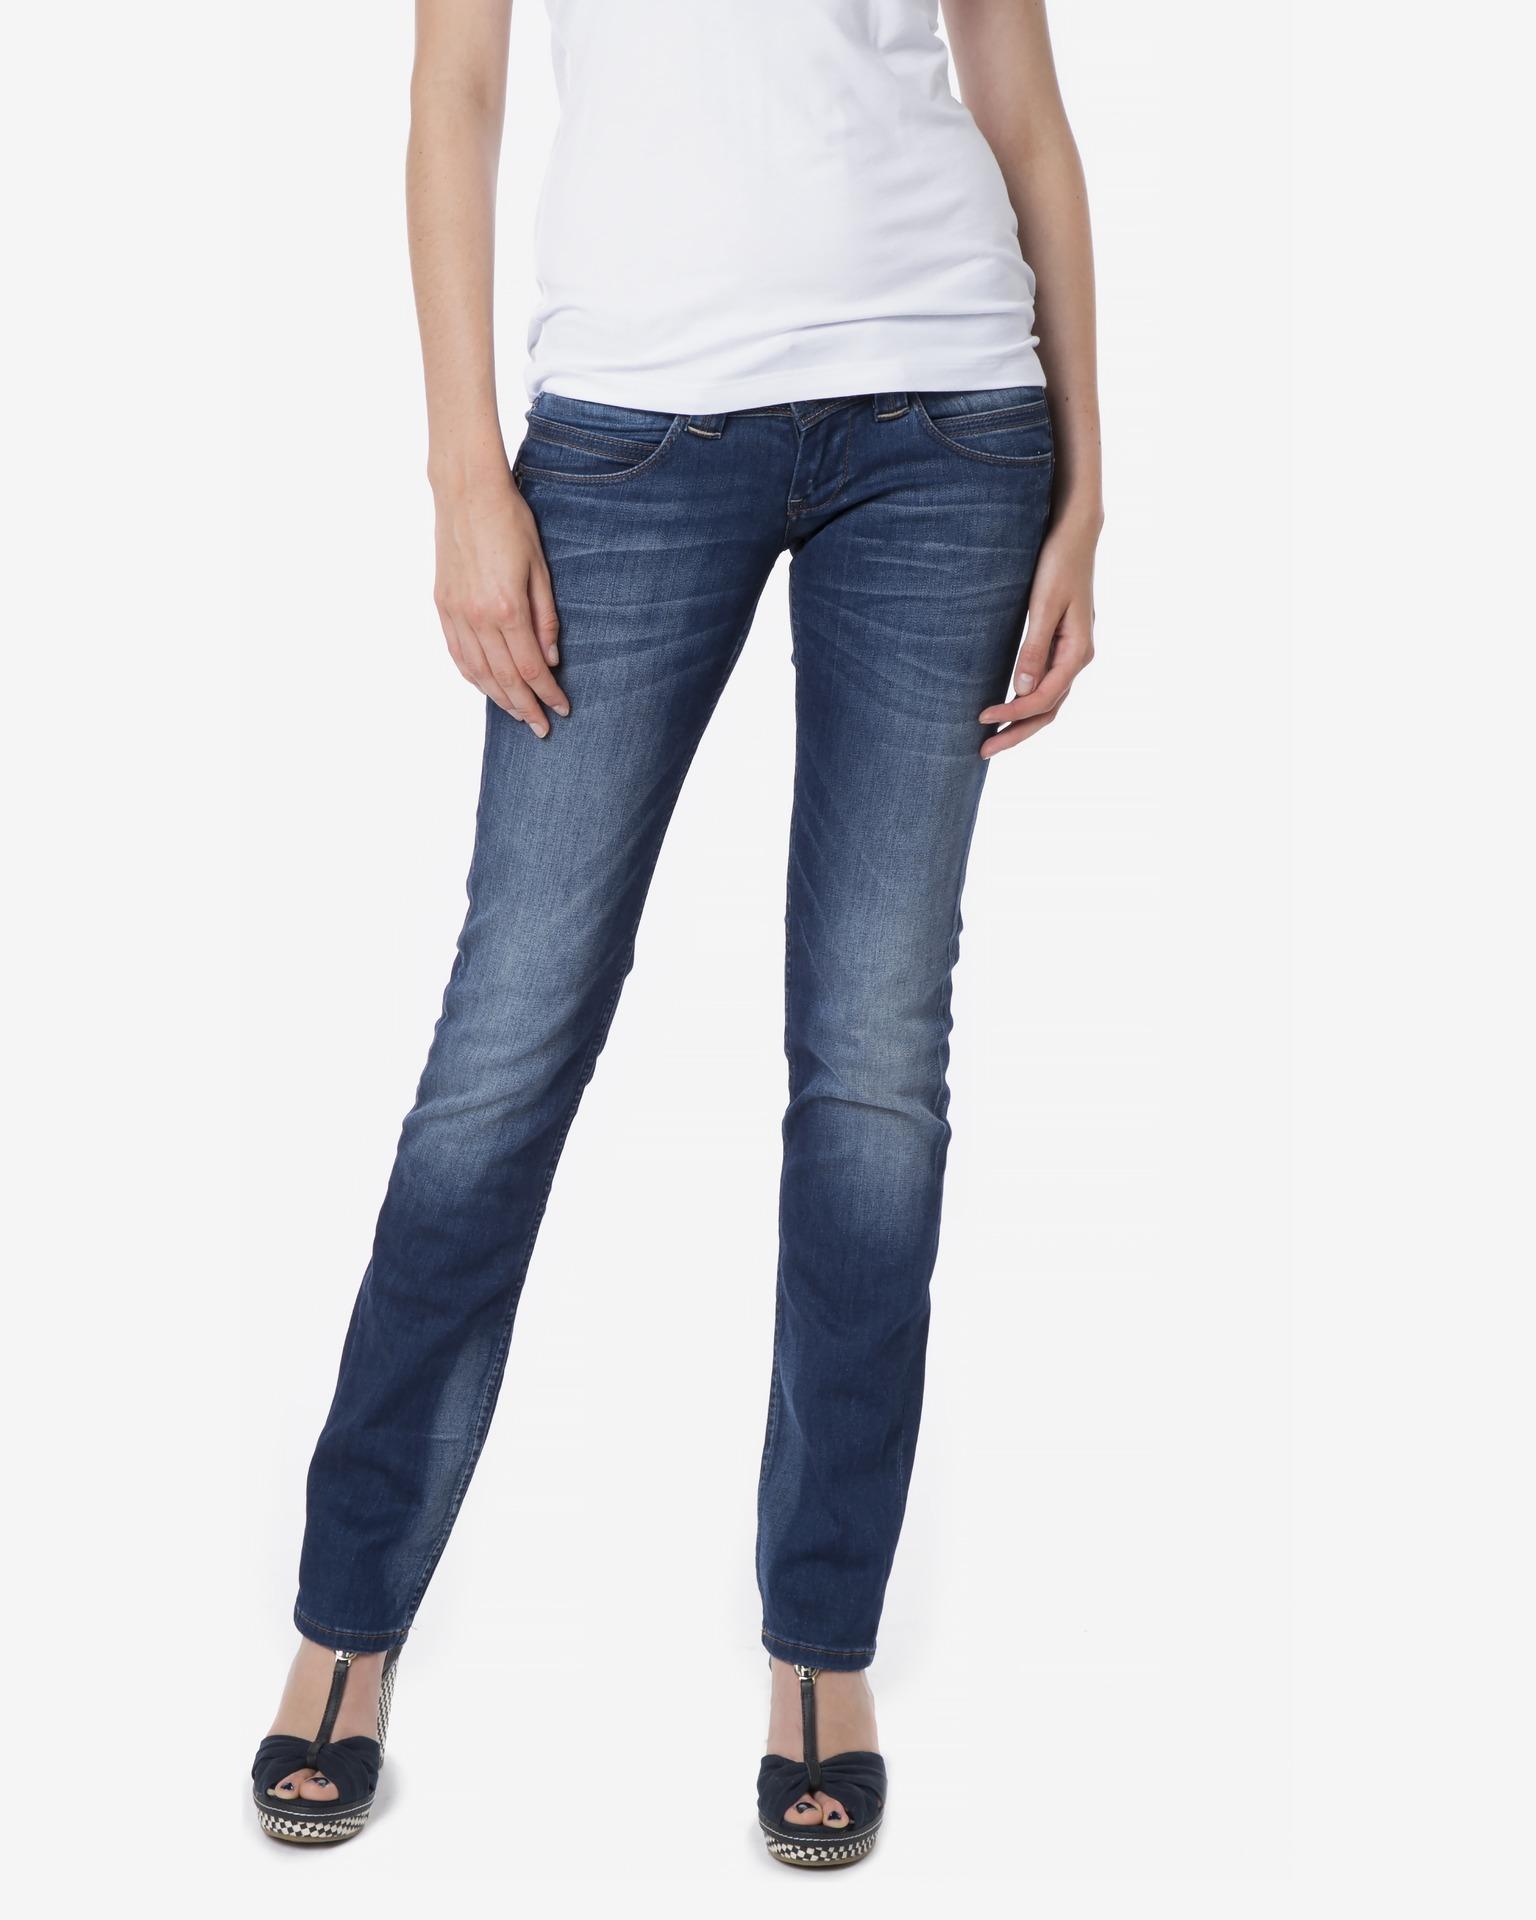 Pepe Jeans - Venus Farmernadrág  745544d14b